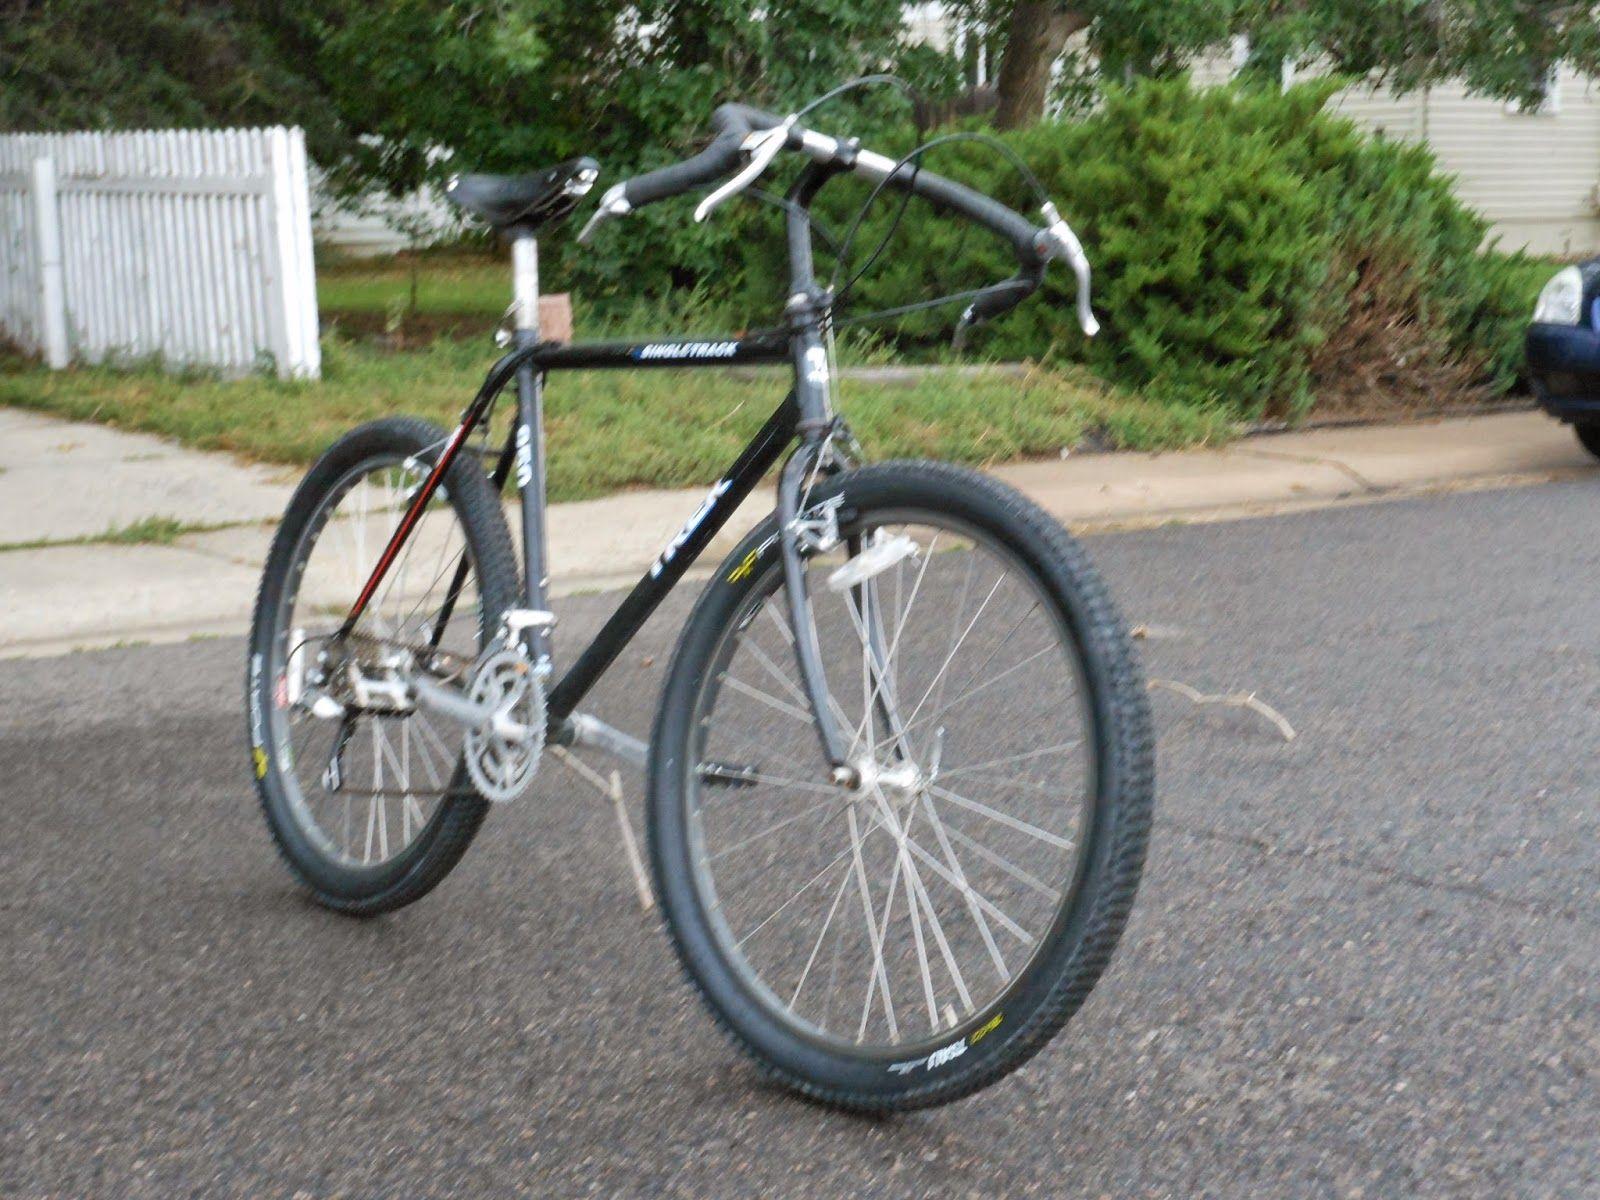 74838857d75 Trek 930 | Bicycles | Mountain bike frames, Bike frame, Vintage bikes